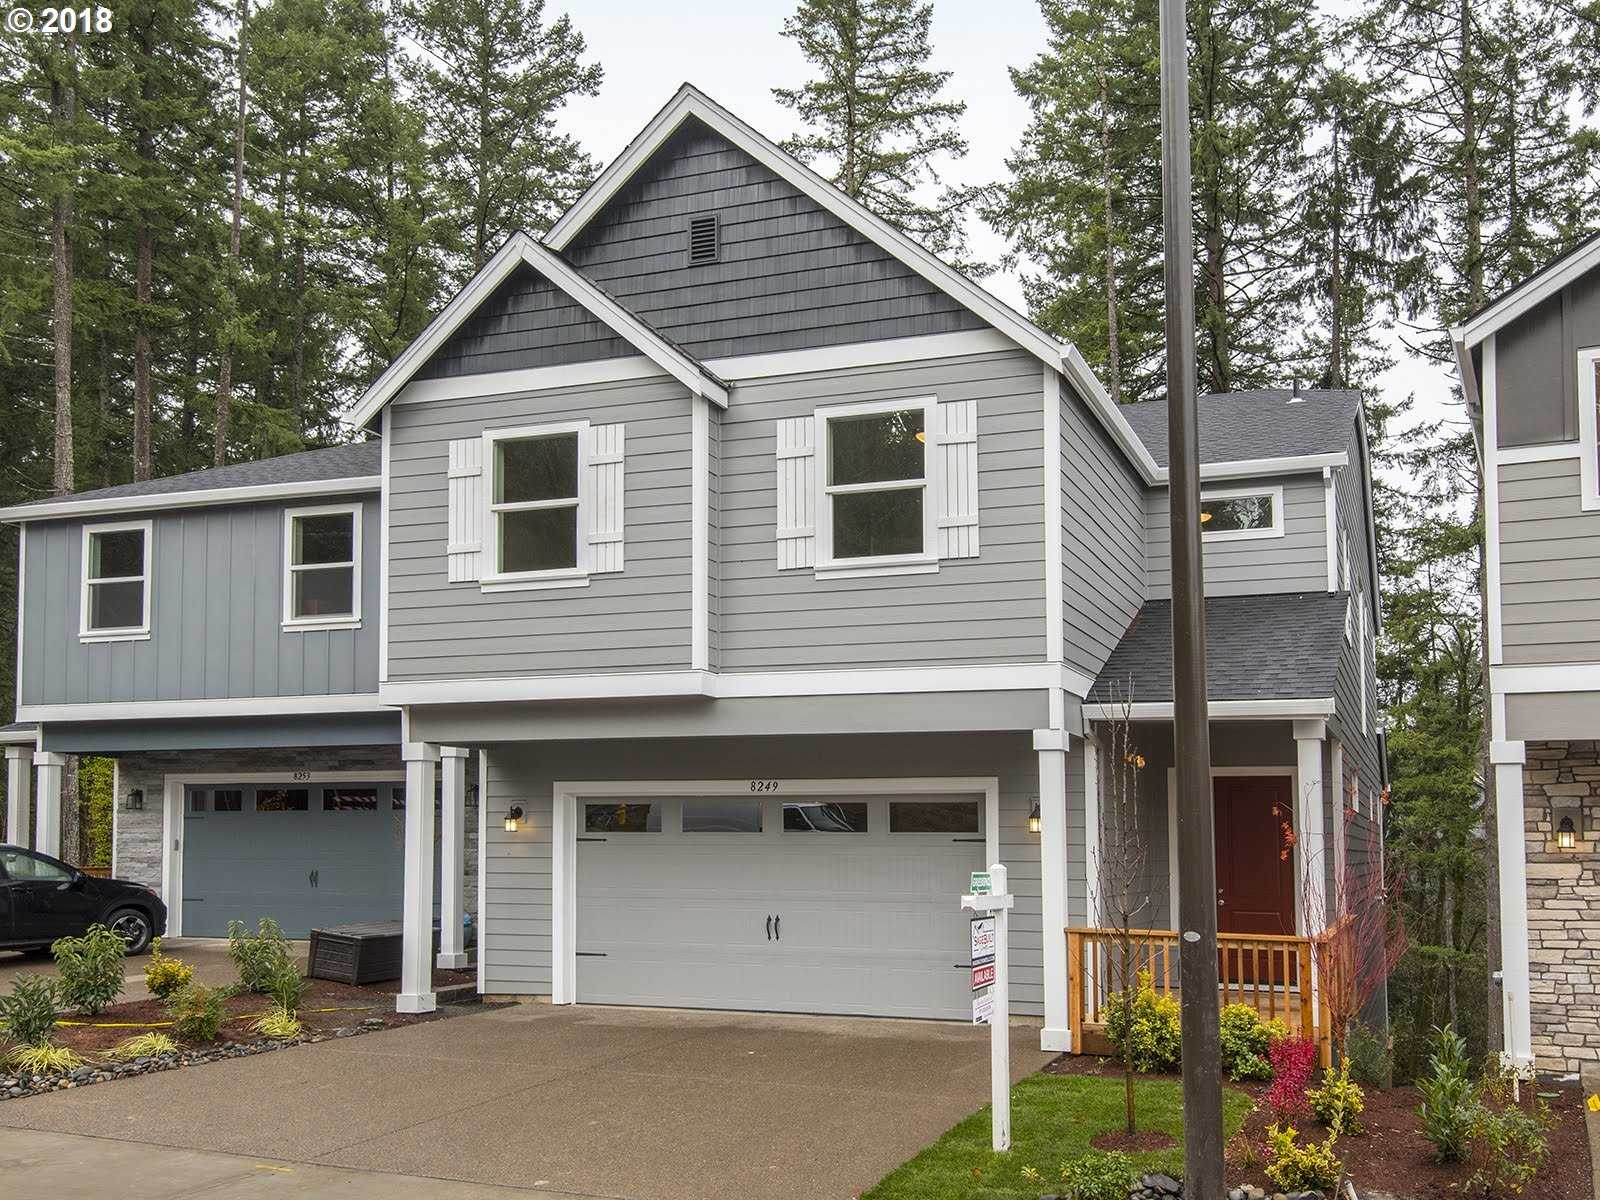 $559,950 - 5Br/4Ba -  for Sale in Beaverton